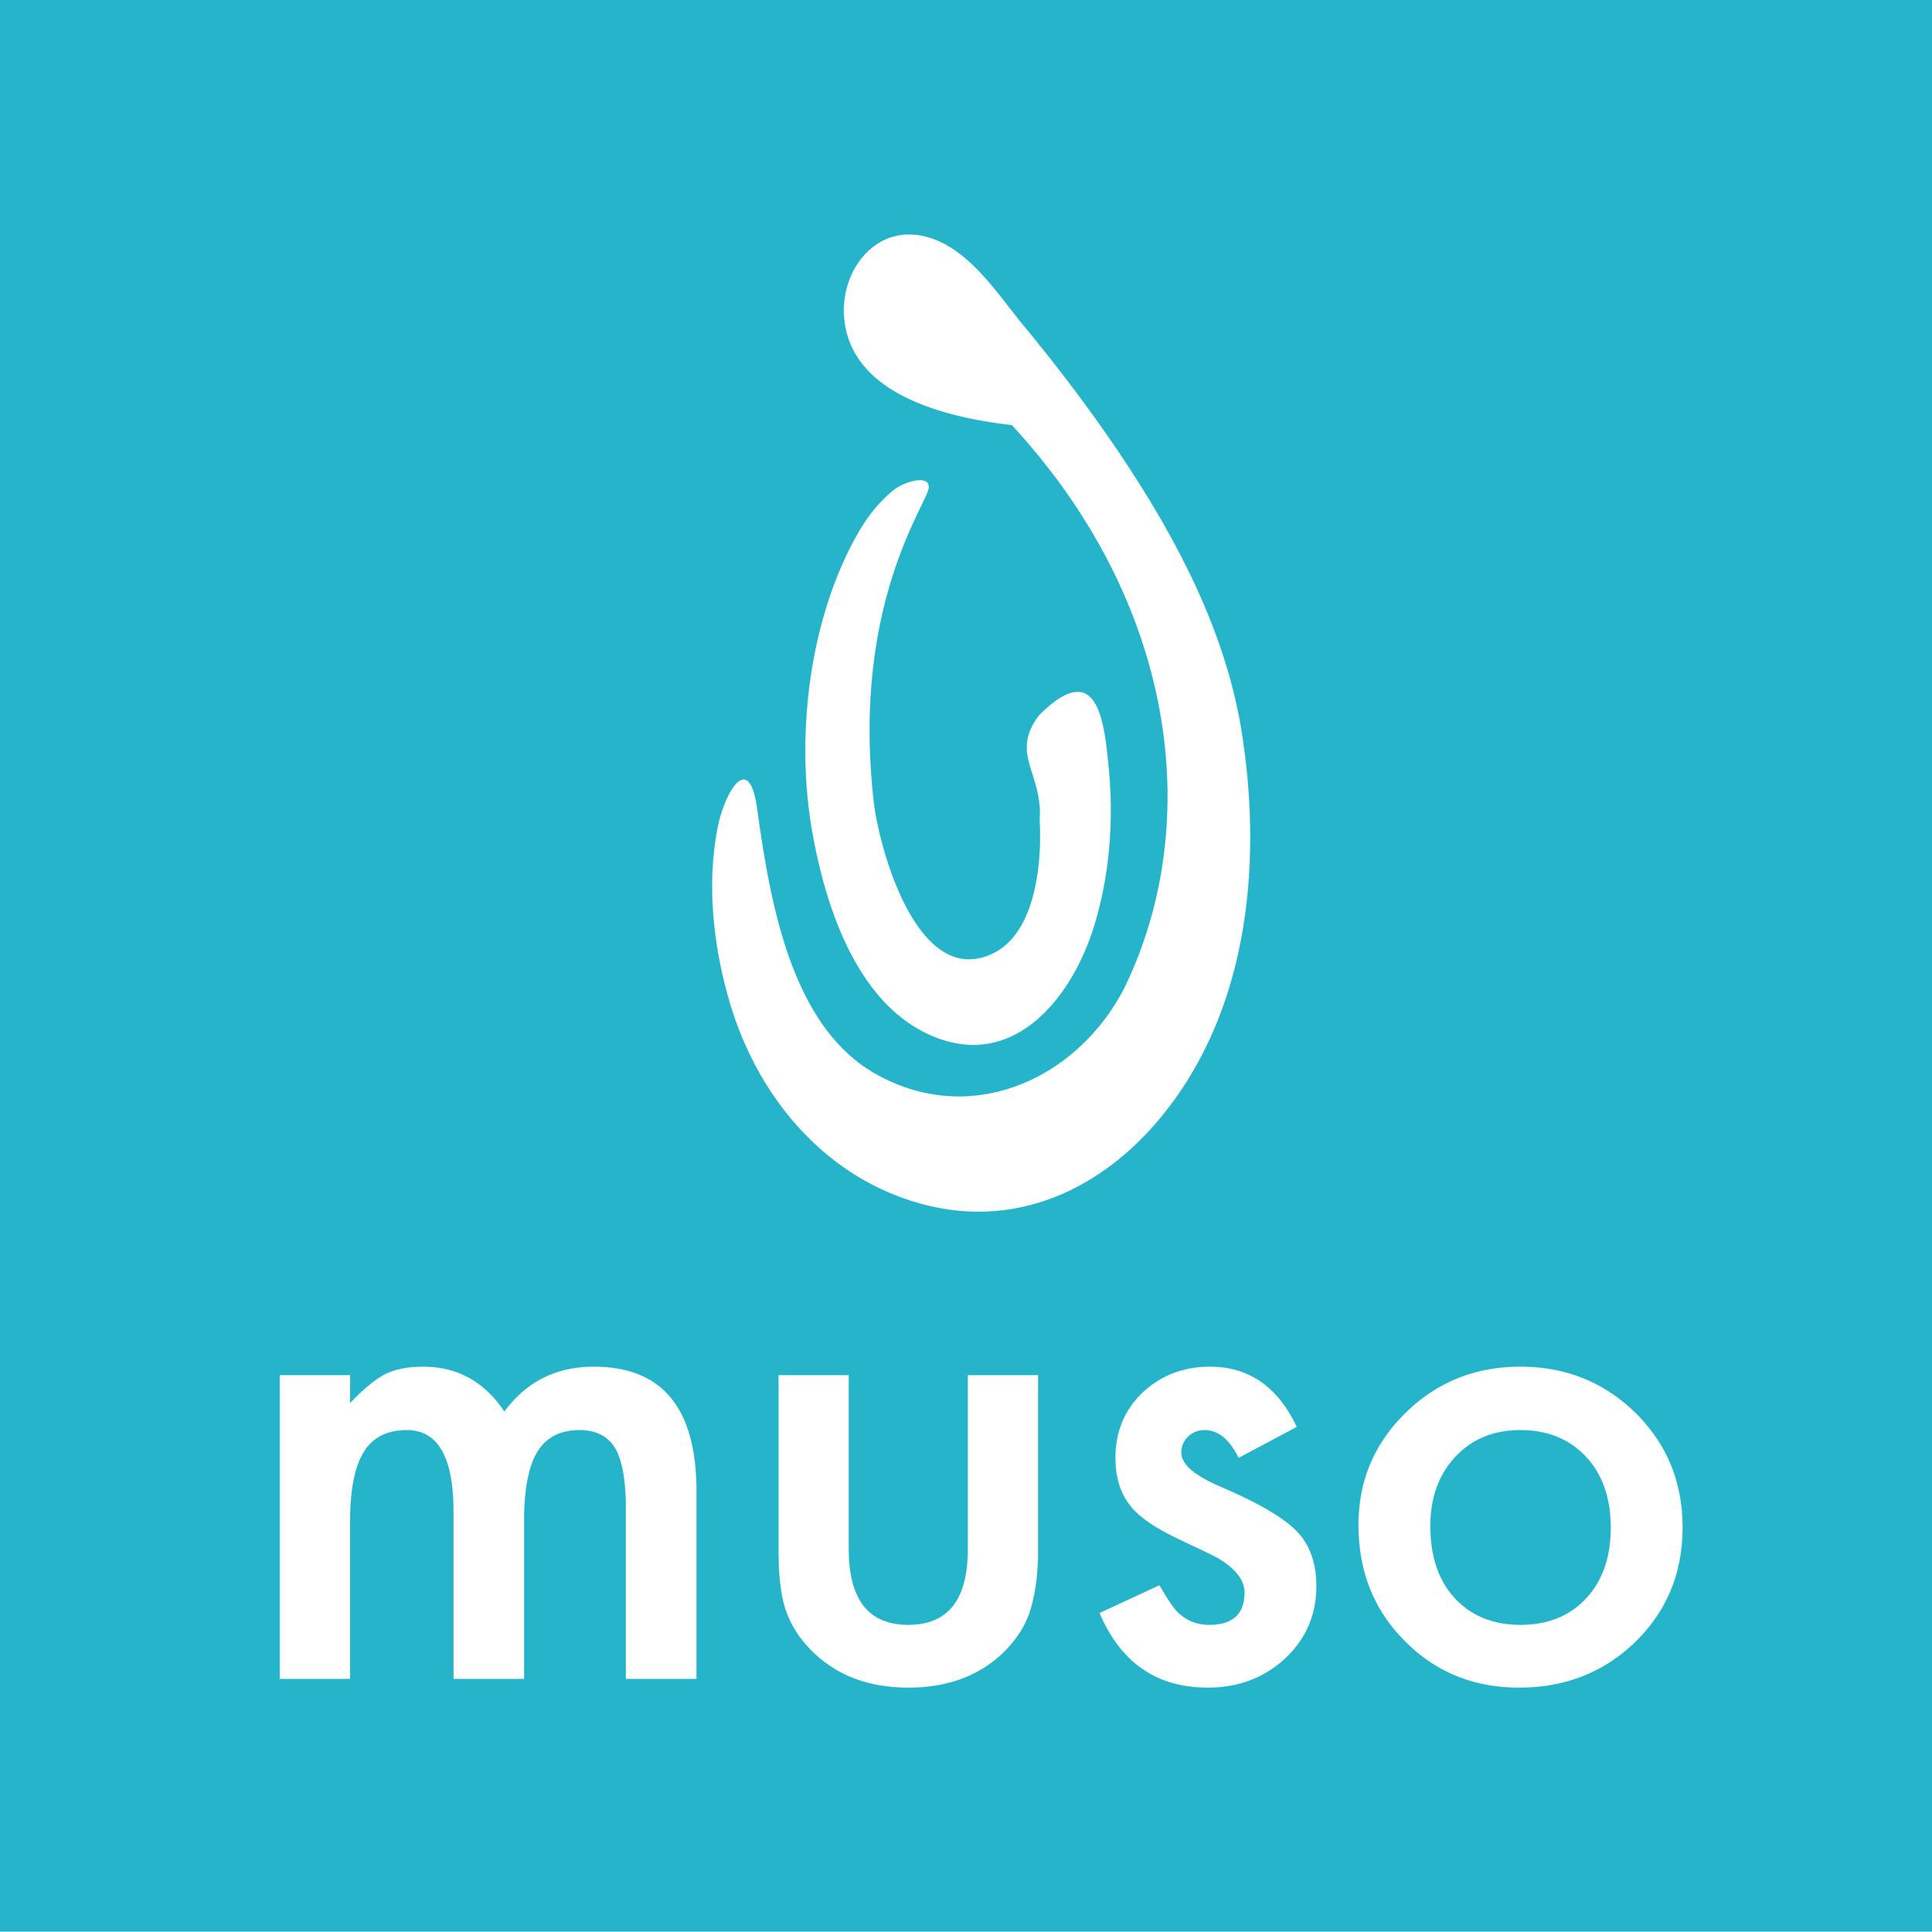 muso-white-logo-01.jpg